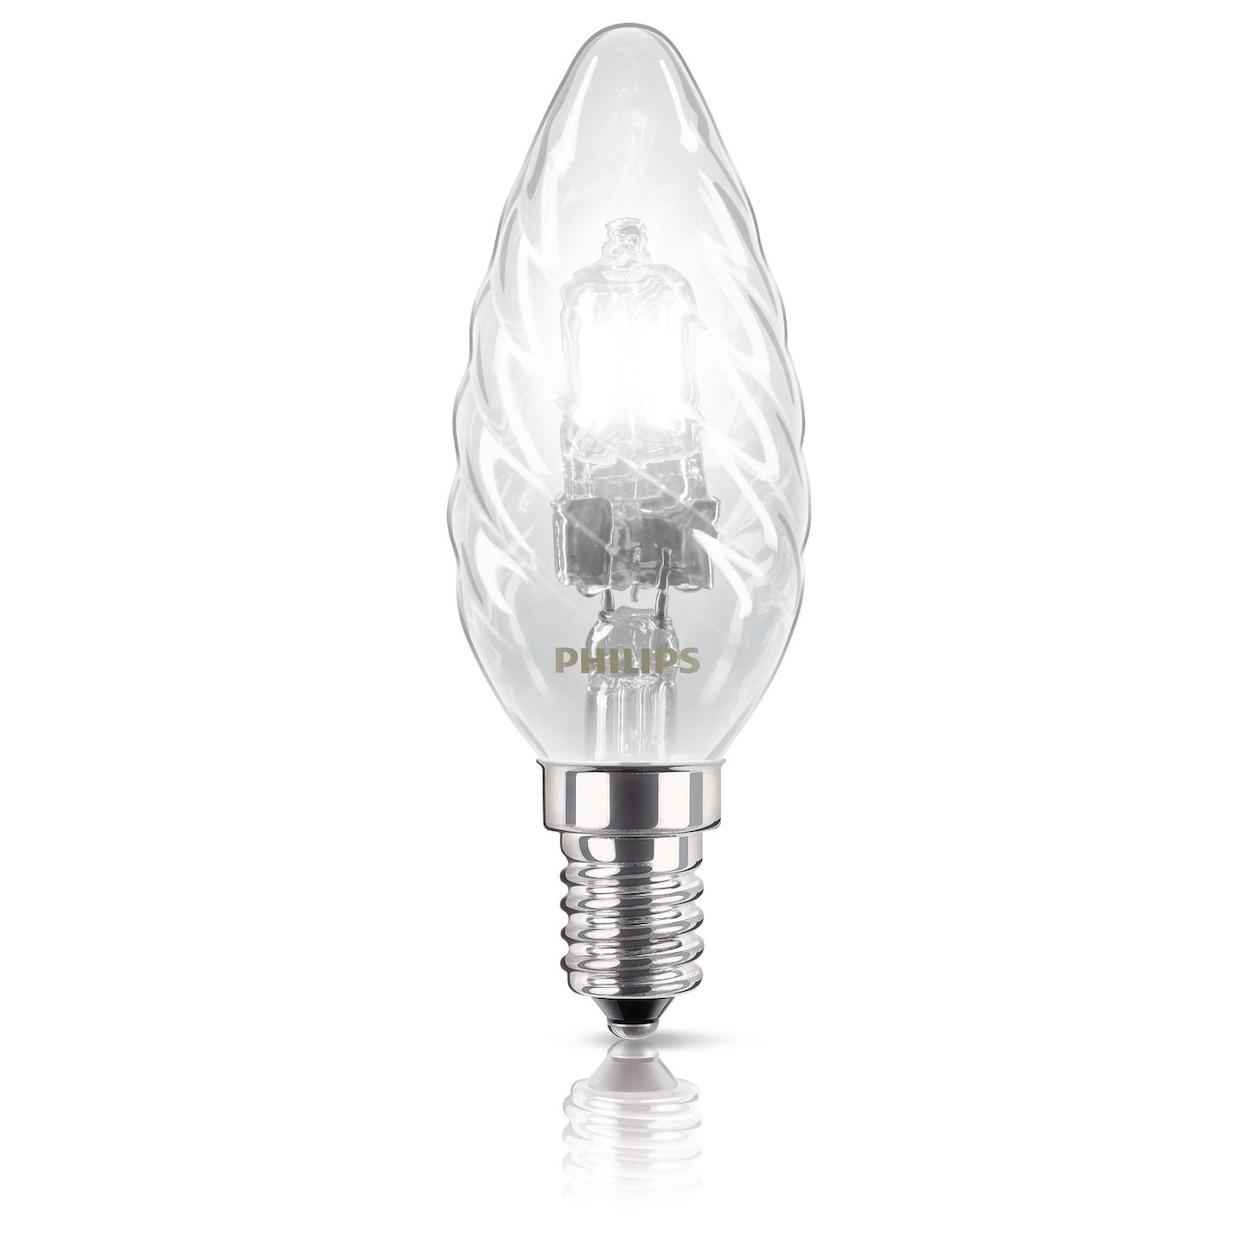 Philips halogeenlamp E14 42W 630Lm kaars gedraaid